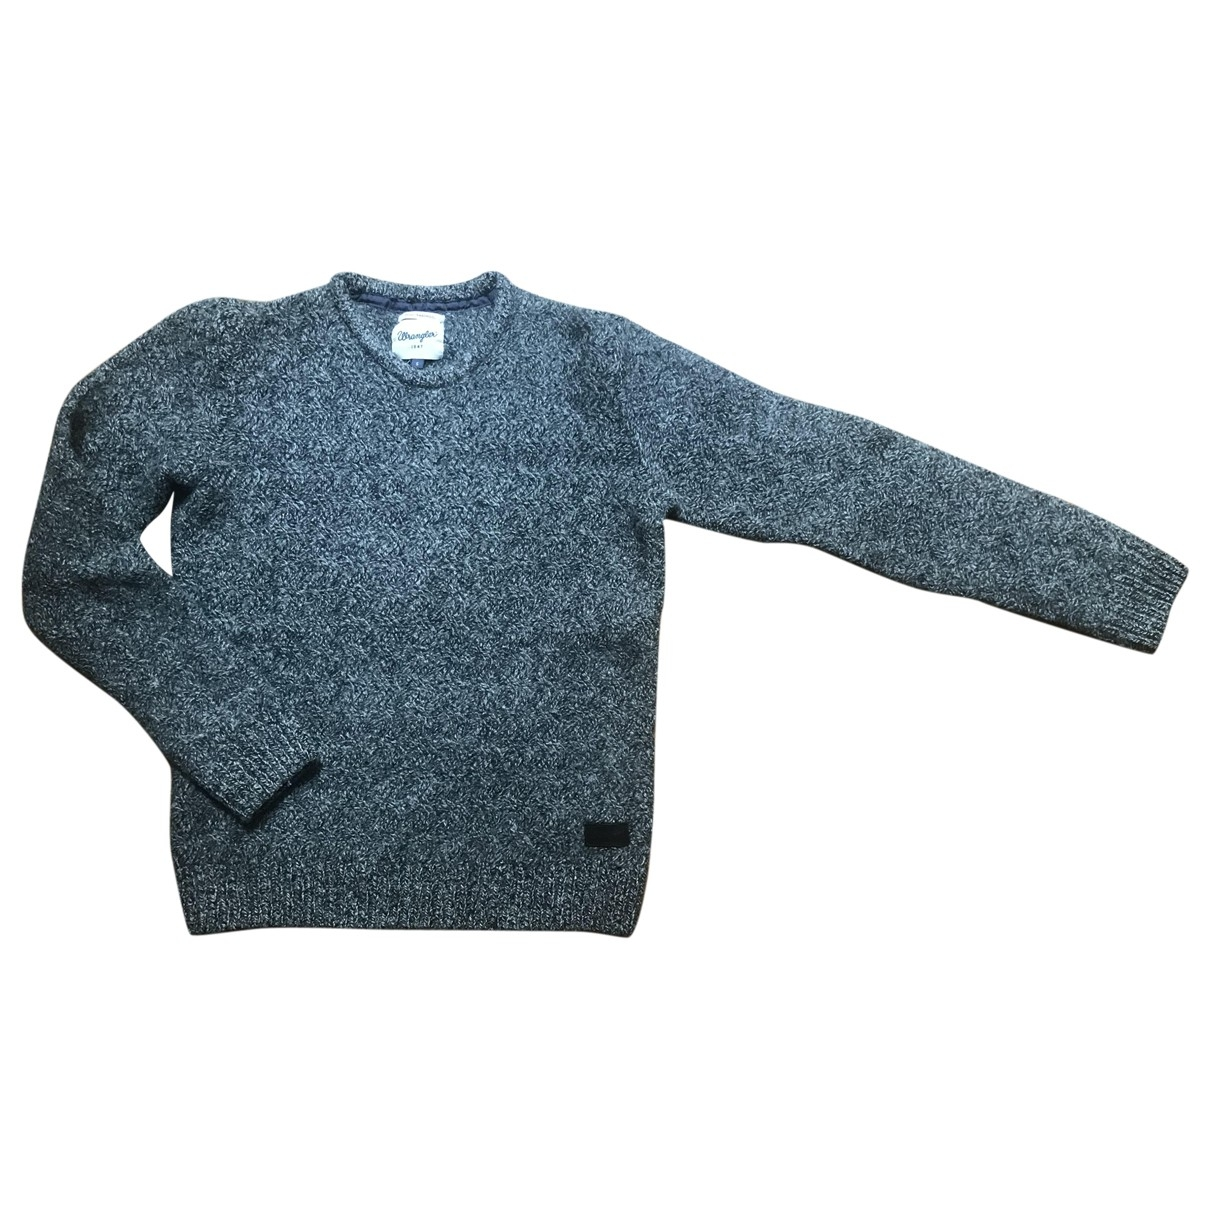 Wrangler - Pull   pour femme en laine - gris